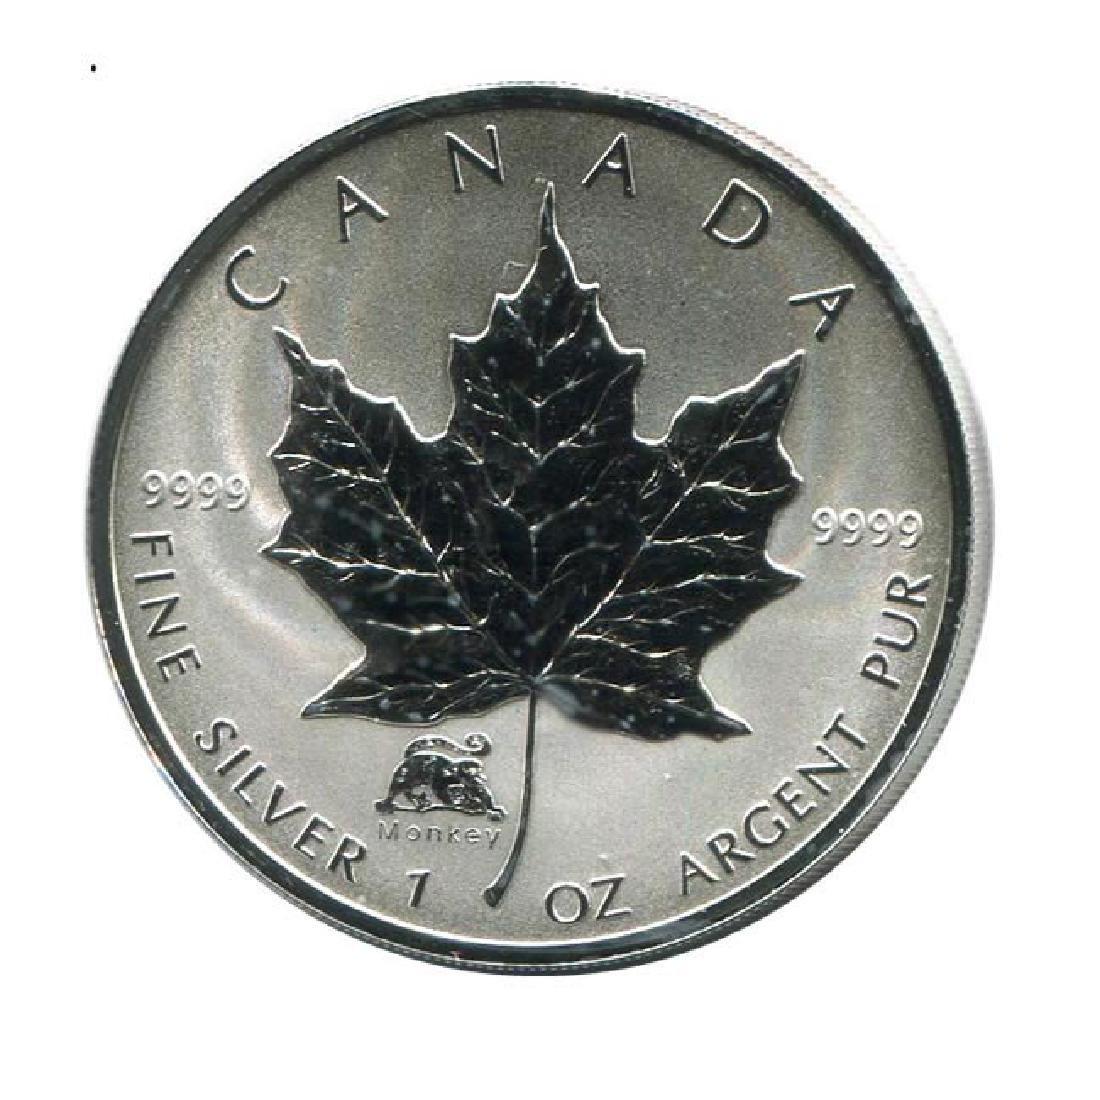 2004 Canada 1 oz. Silver Maple Leaf Reverse Proof Monke